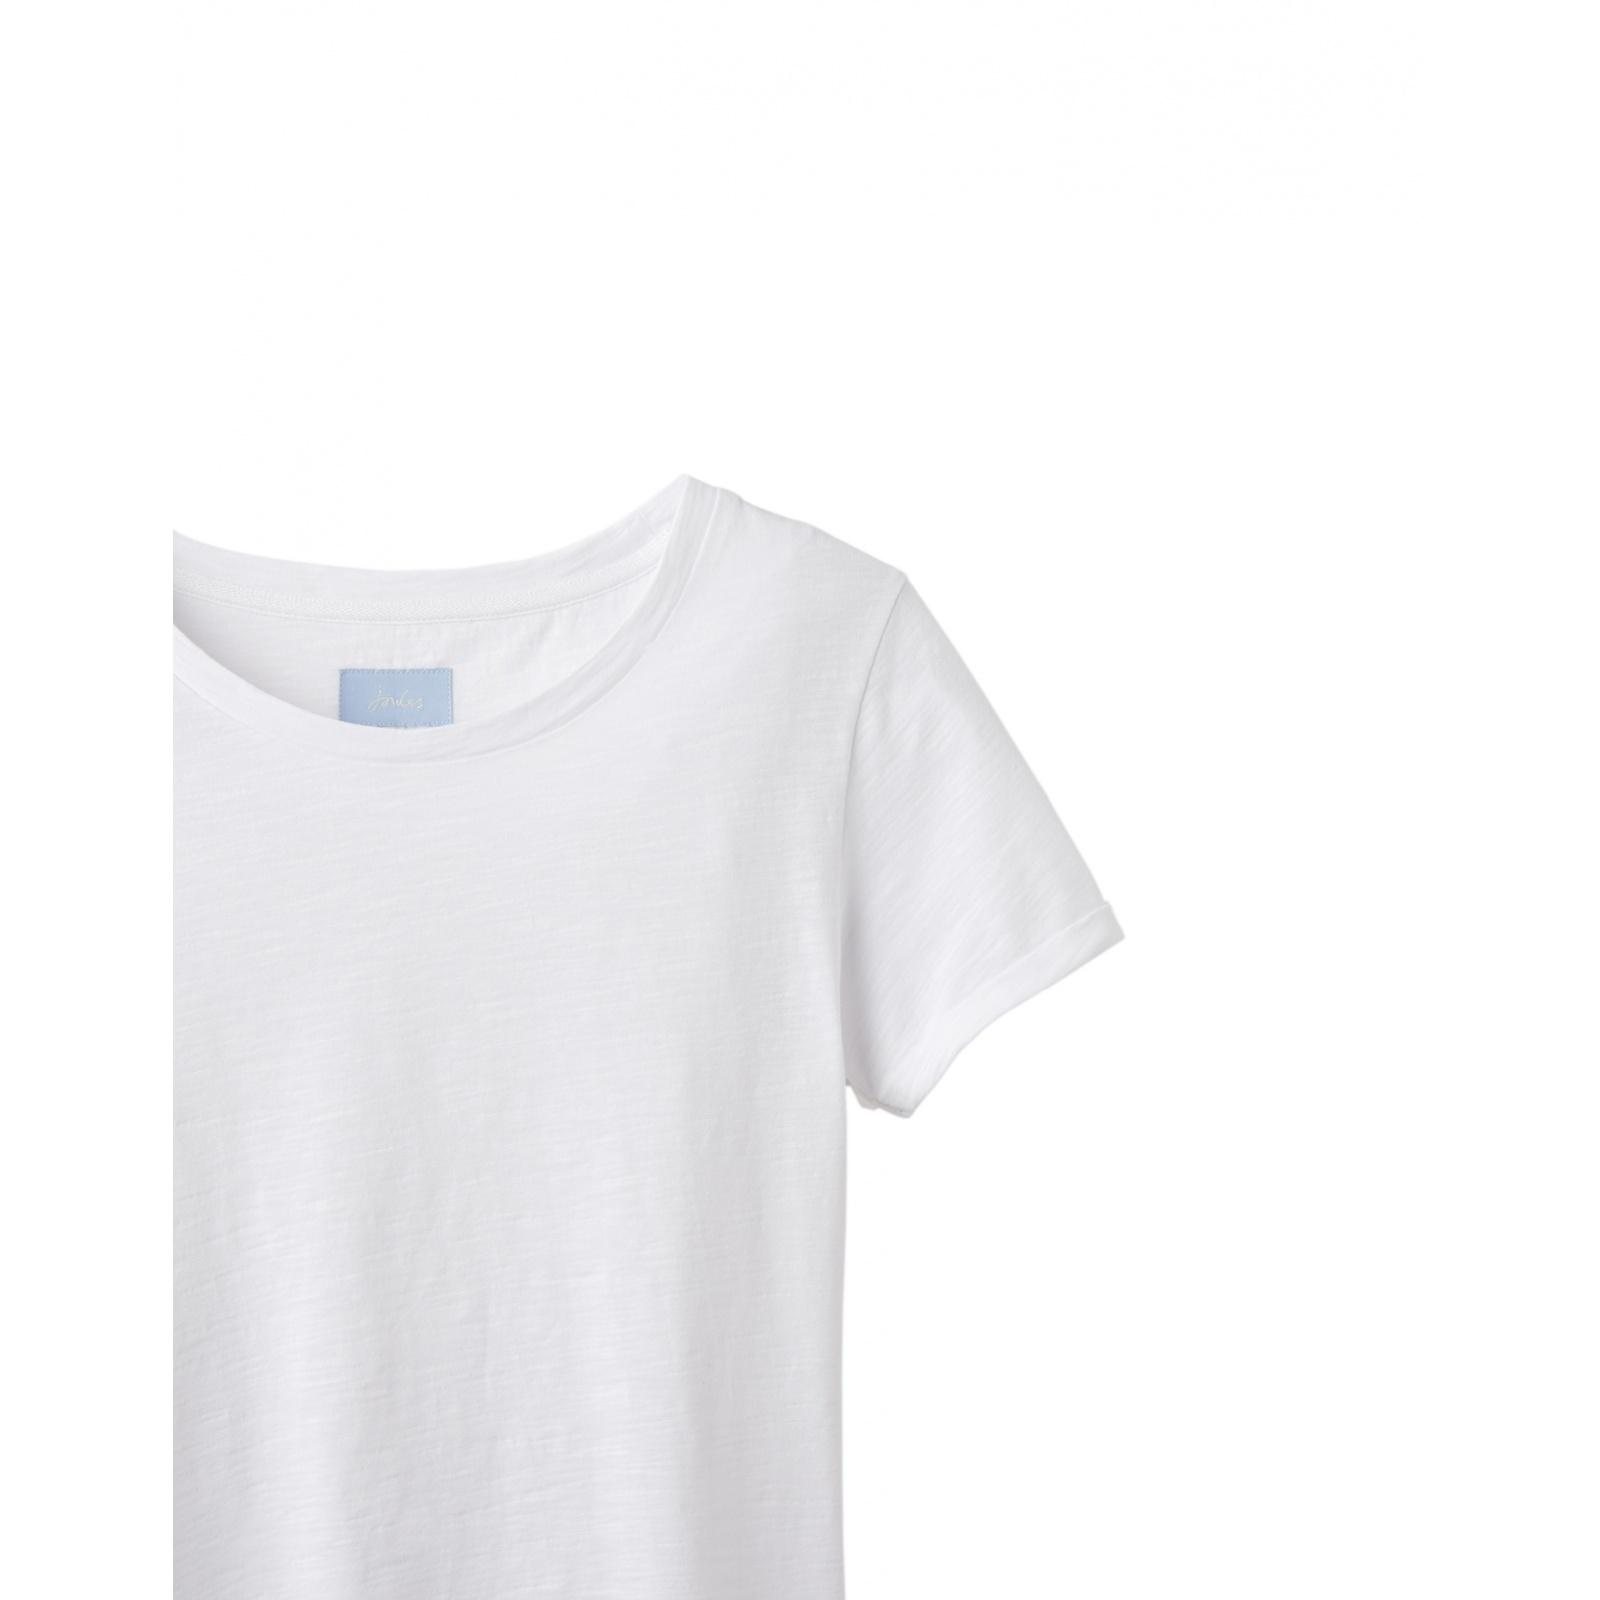 Joules-Nessa-ligero-Jersey-Camiseta-SS19 miniatura 14